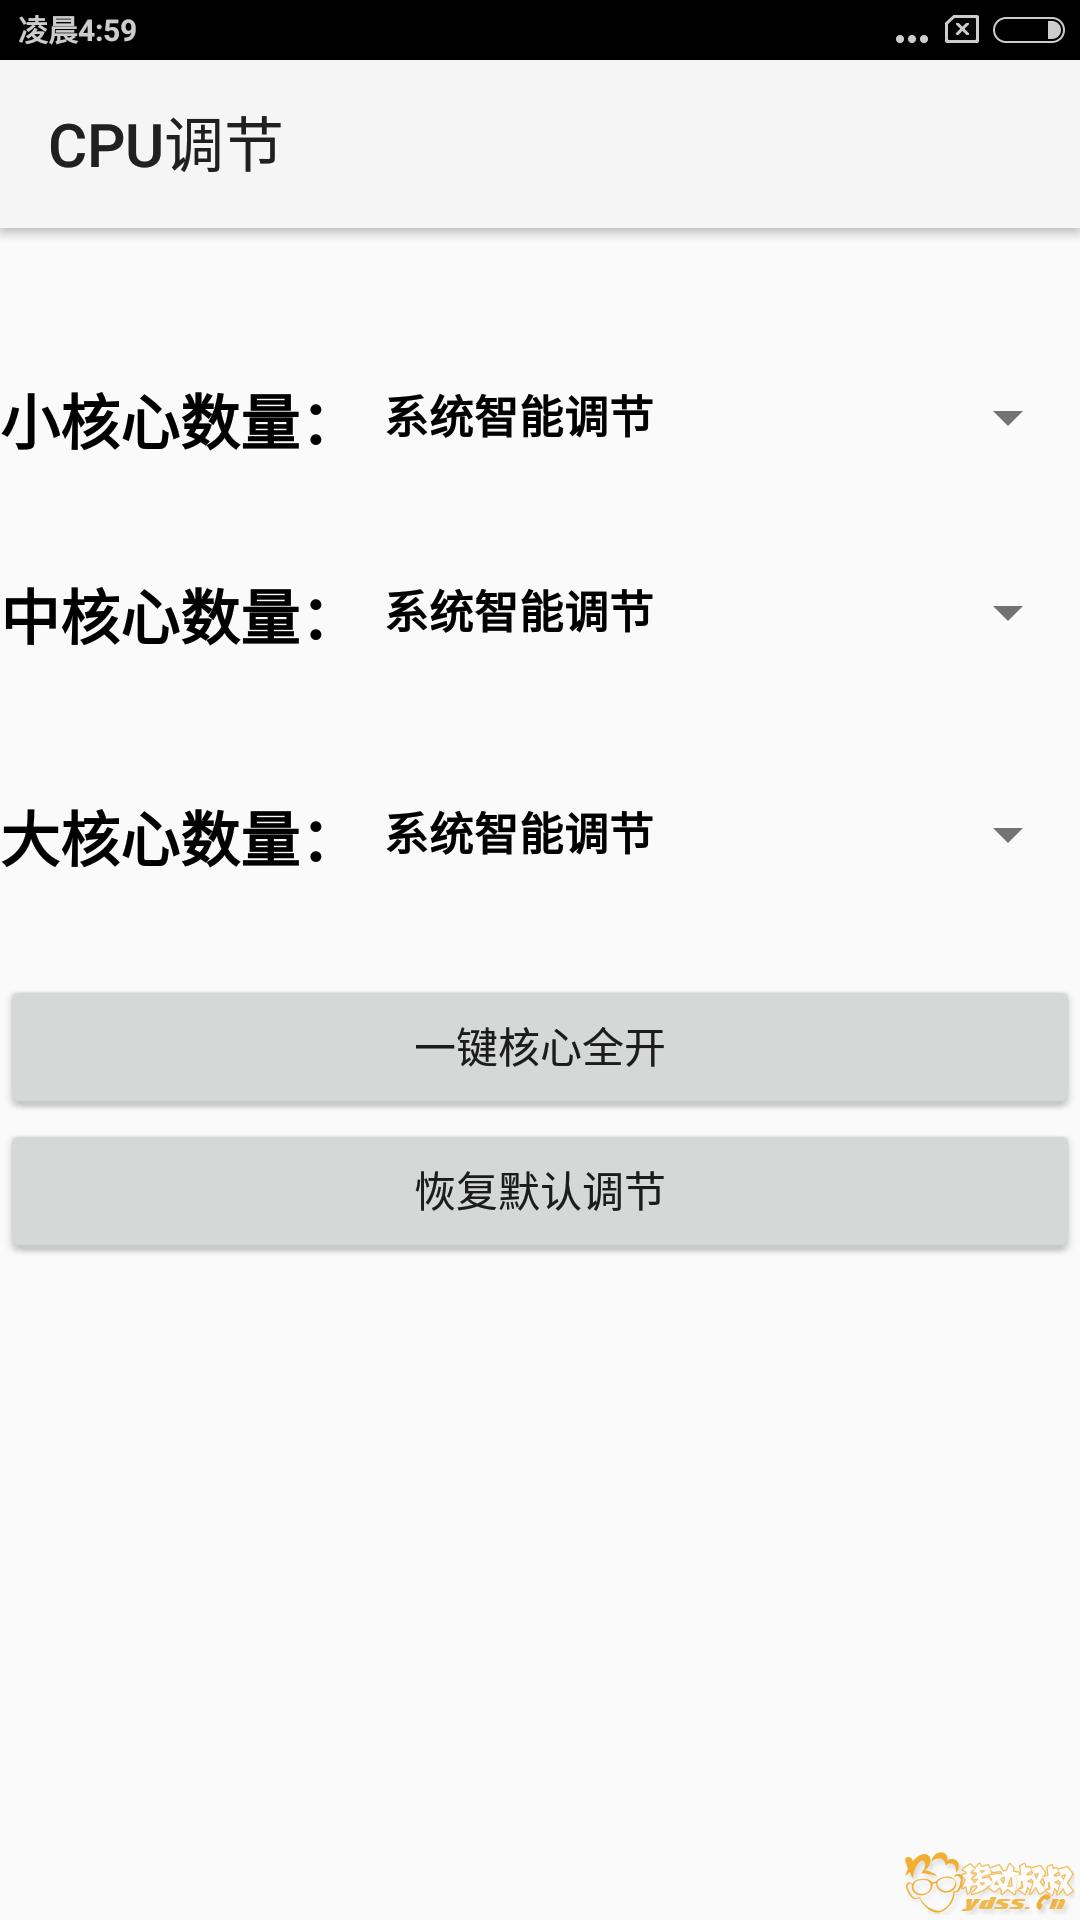 Screenshot_2018-03-12-04-59-46-907_com.eui.xd.png